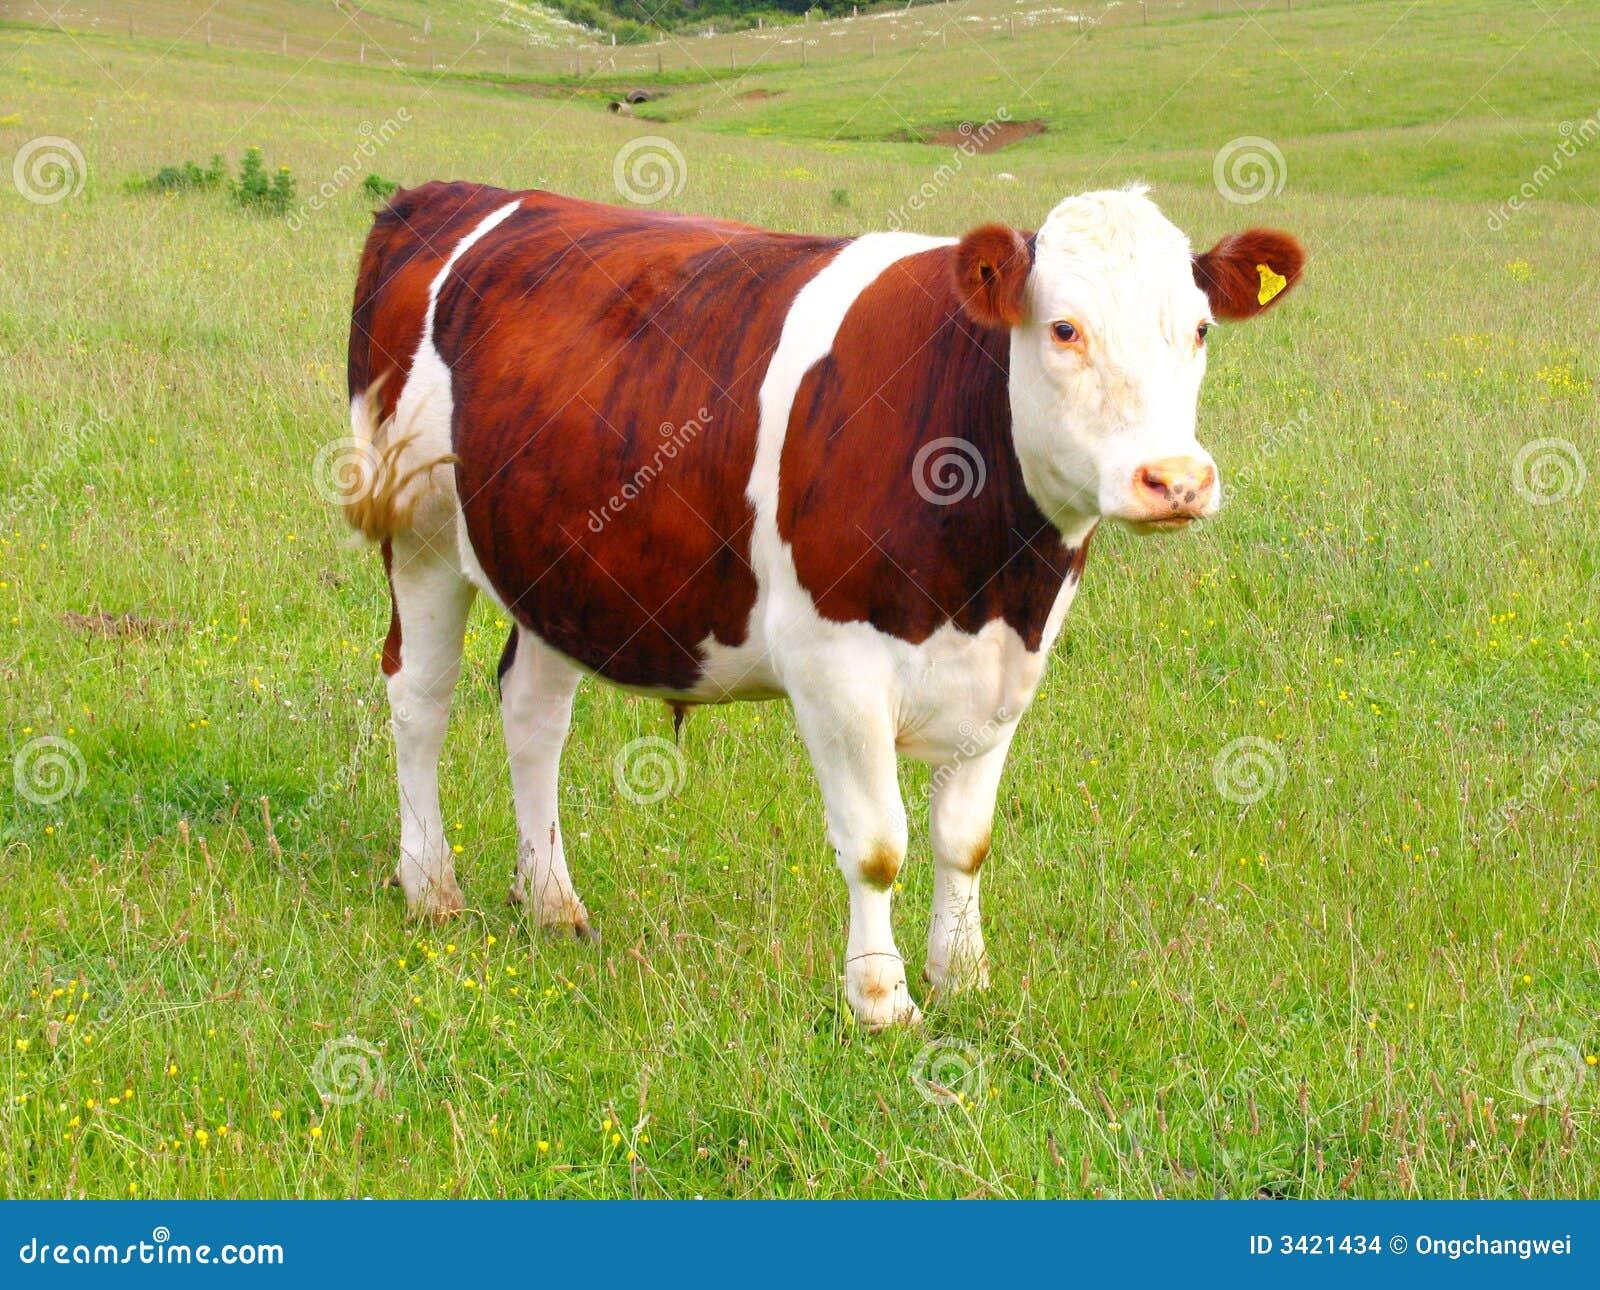 Cow And Grassland